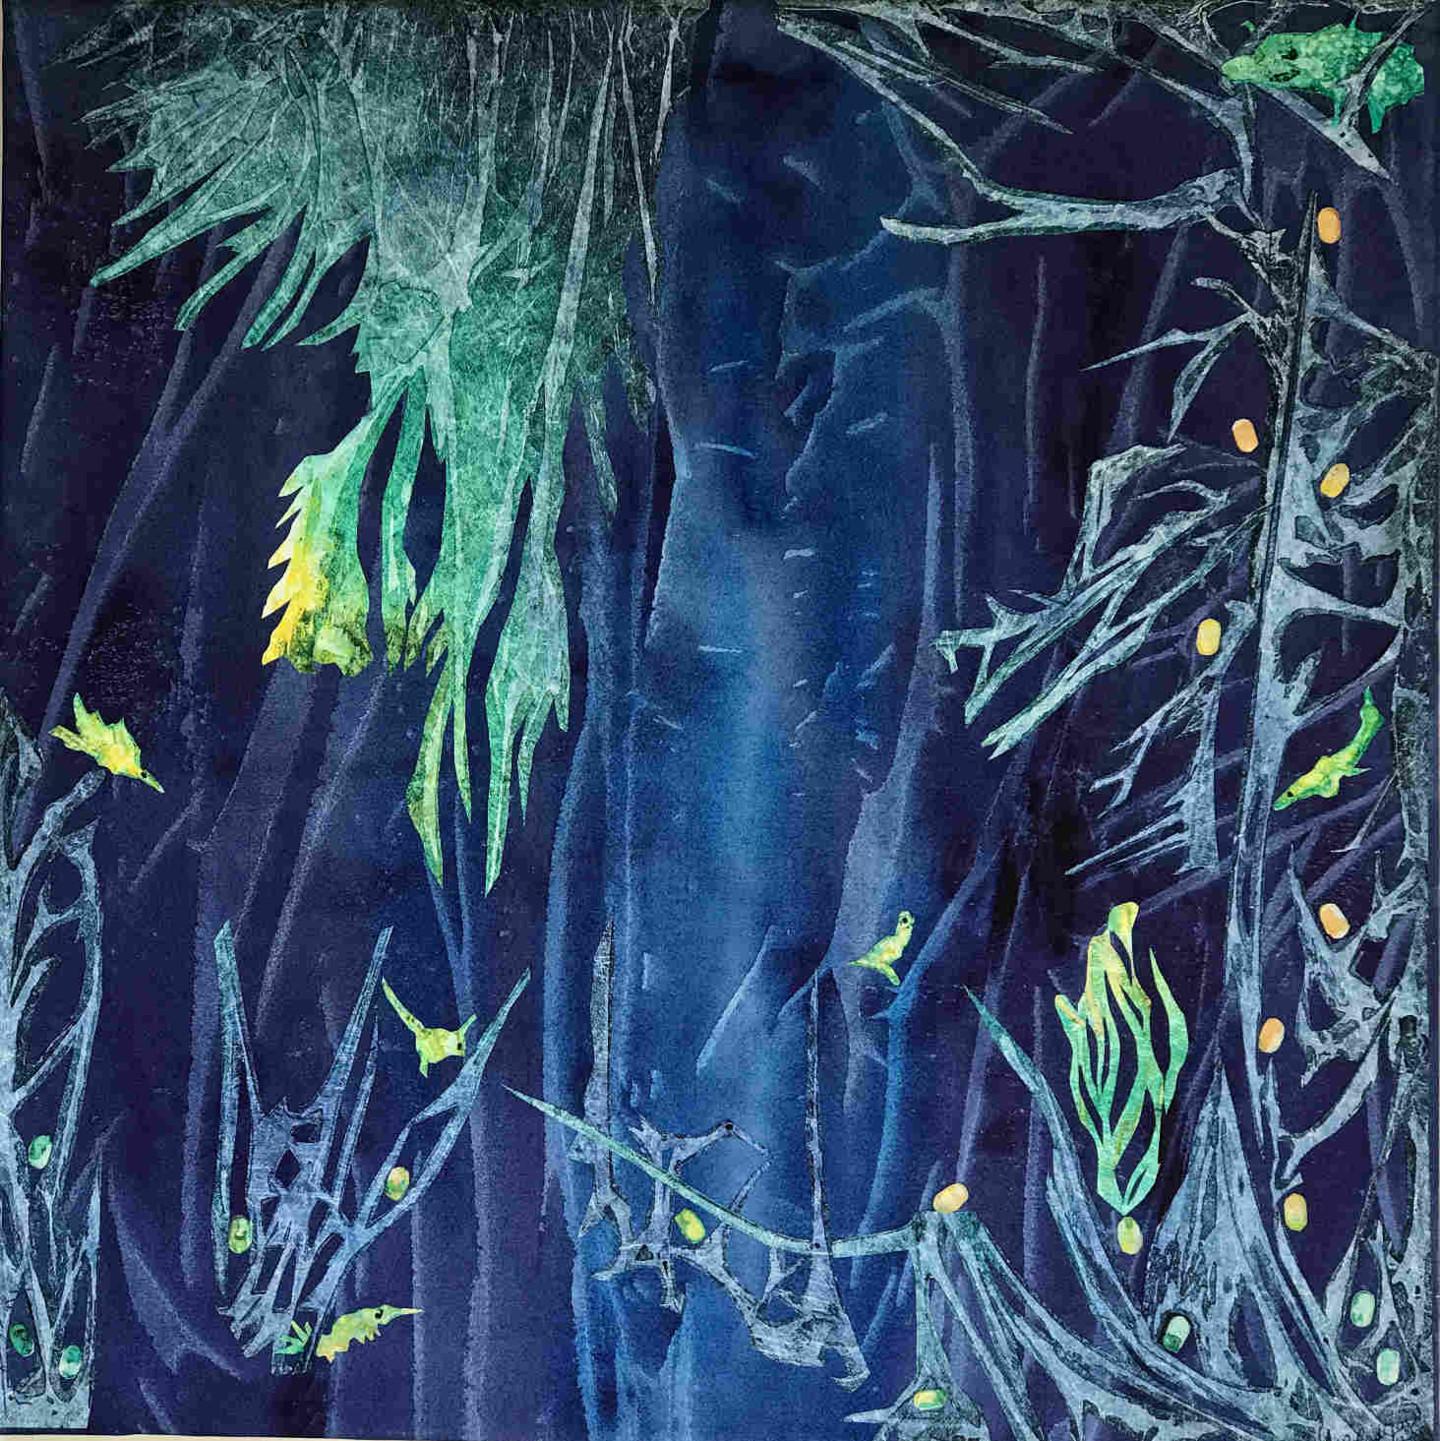 Marie-Annick Radigois - 16-12-oniris-12 40x40maroufle-sur-toile.jpg